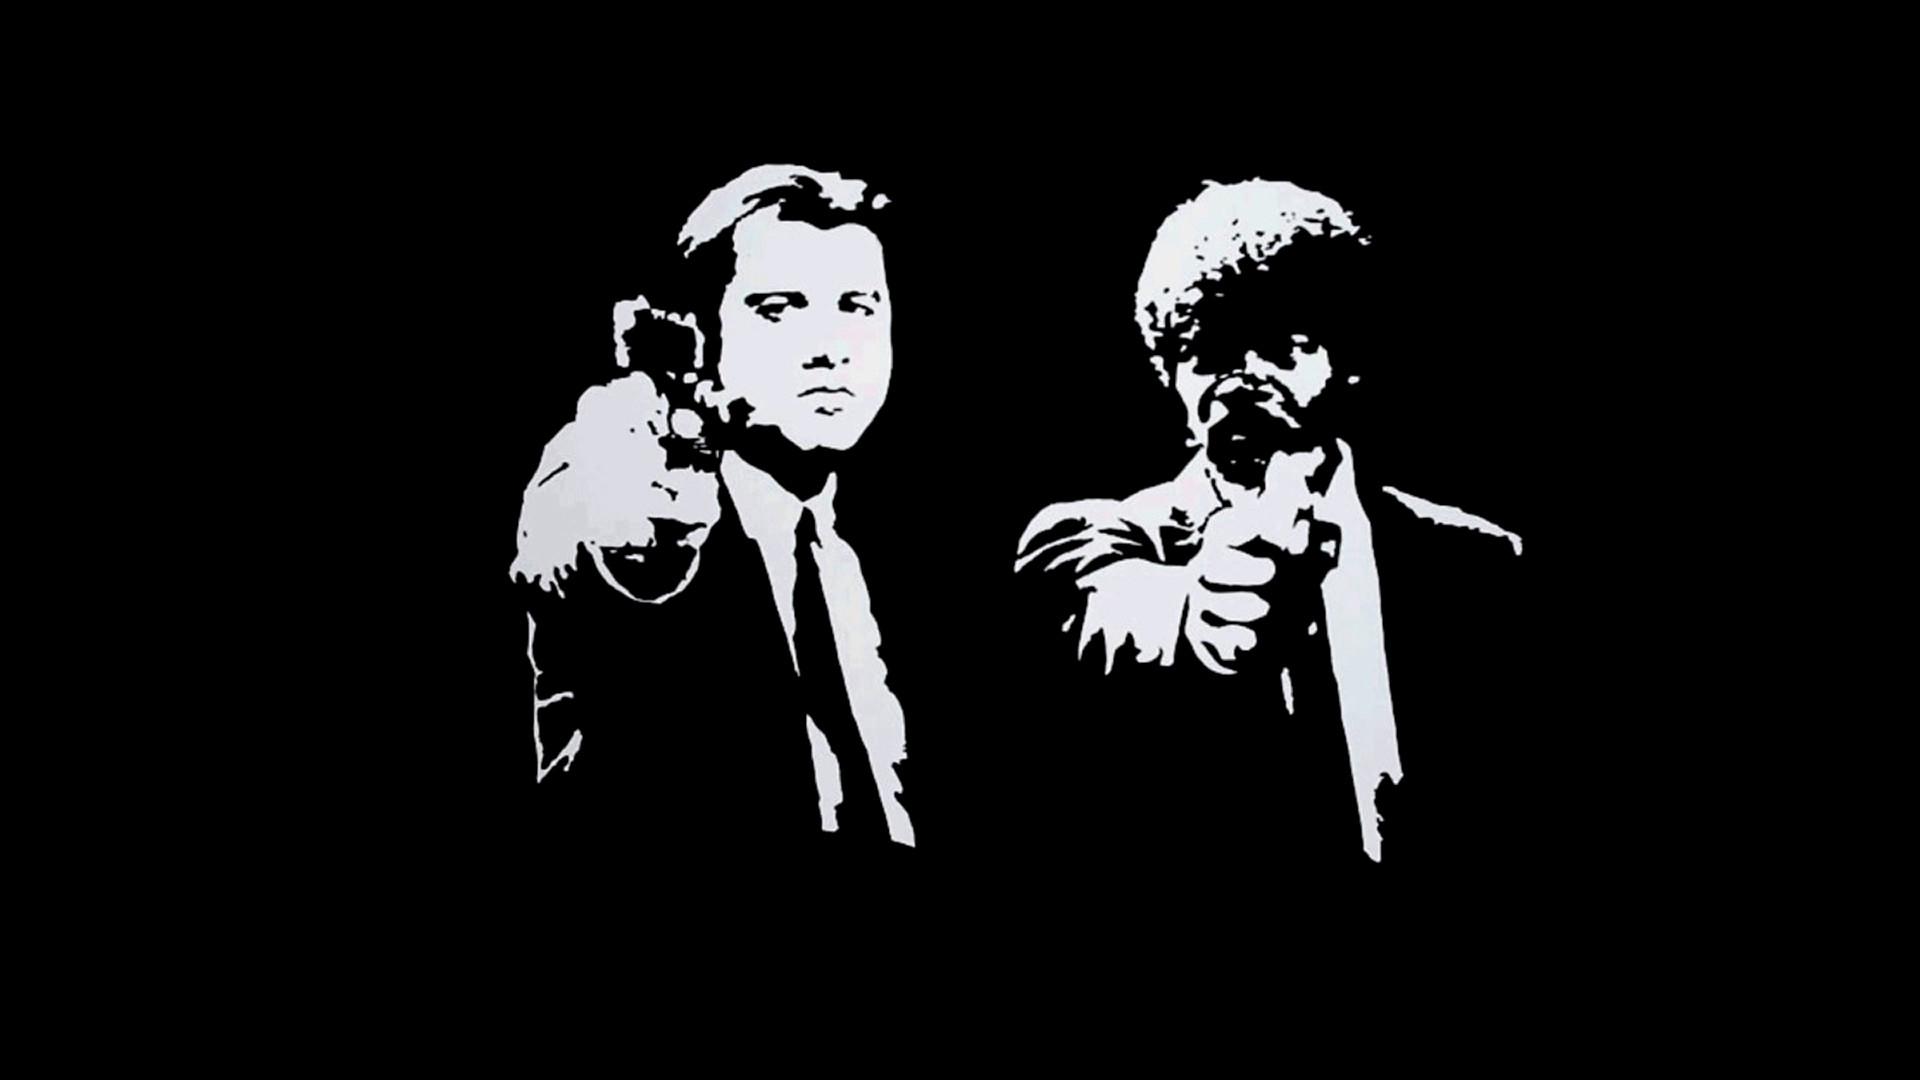 Pulp Fiction | Movie fanart | fanart.tv